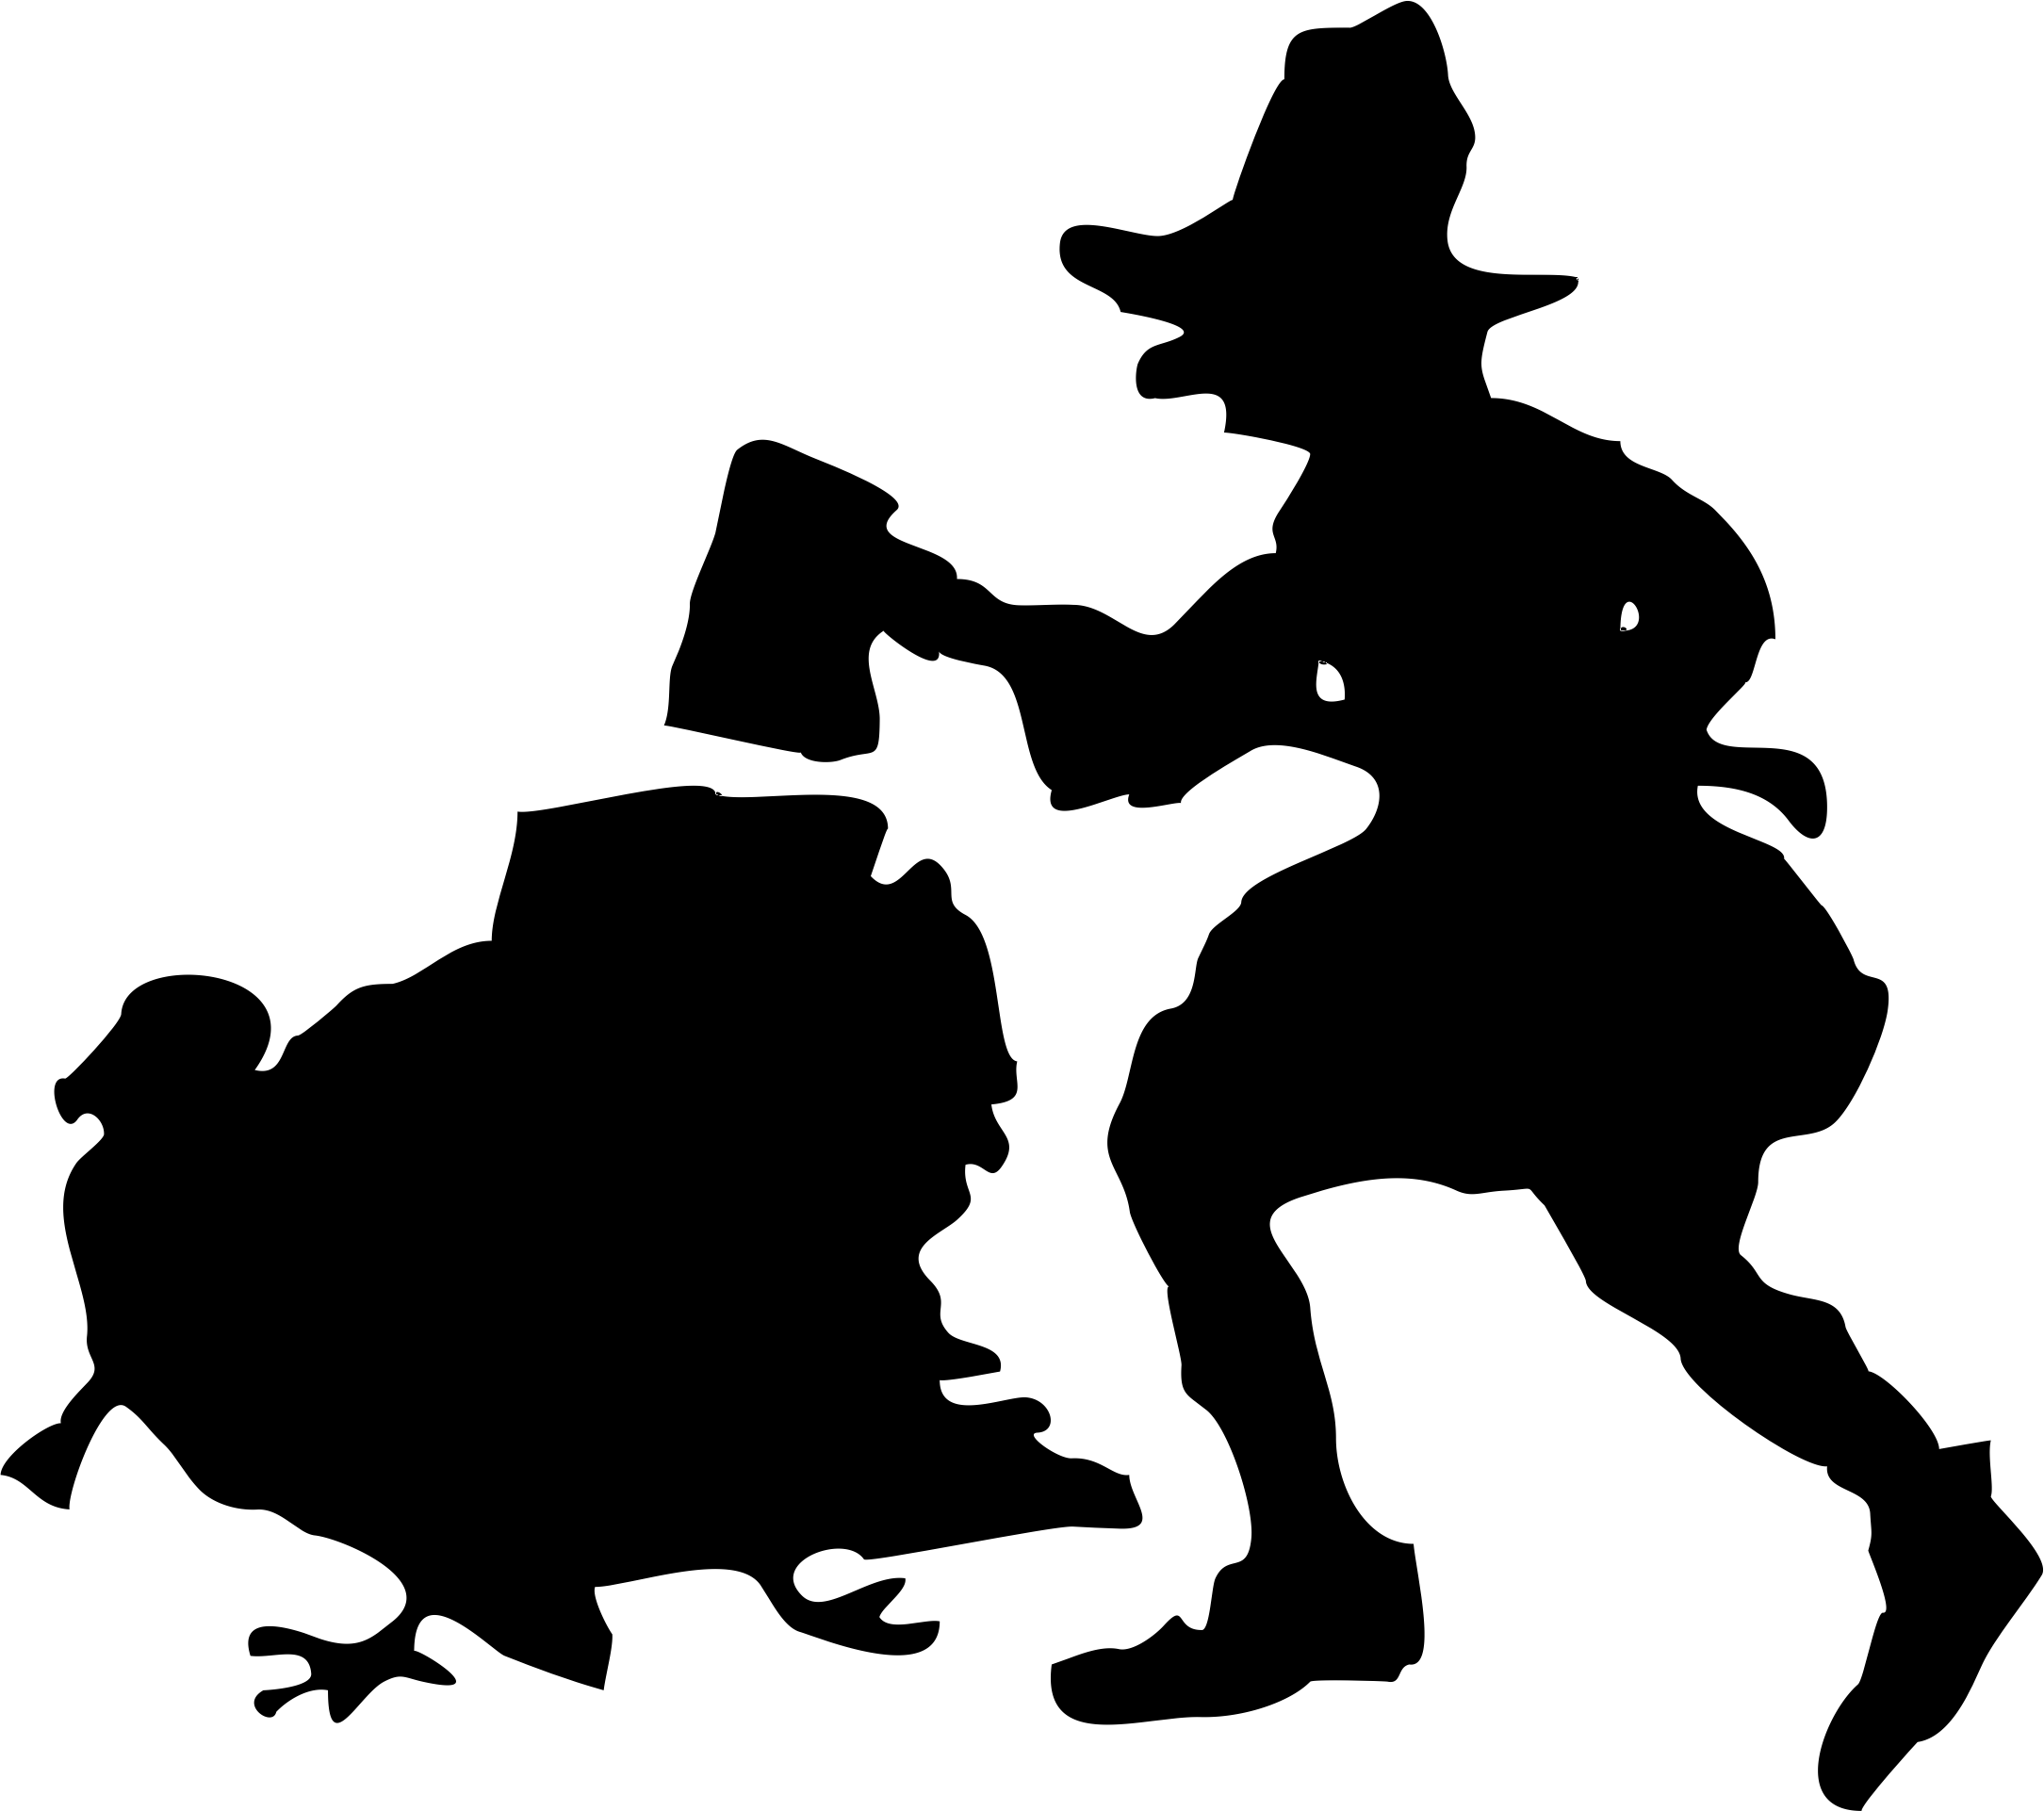 Turkey hunt silhouette hunt Clipart